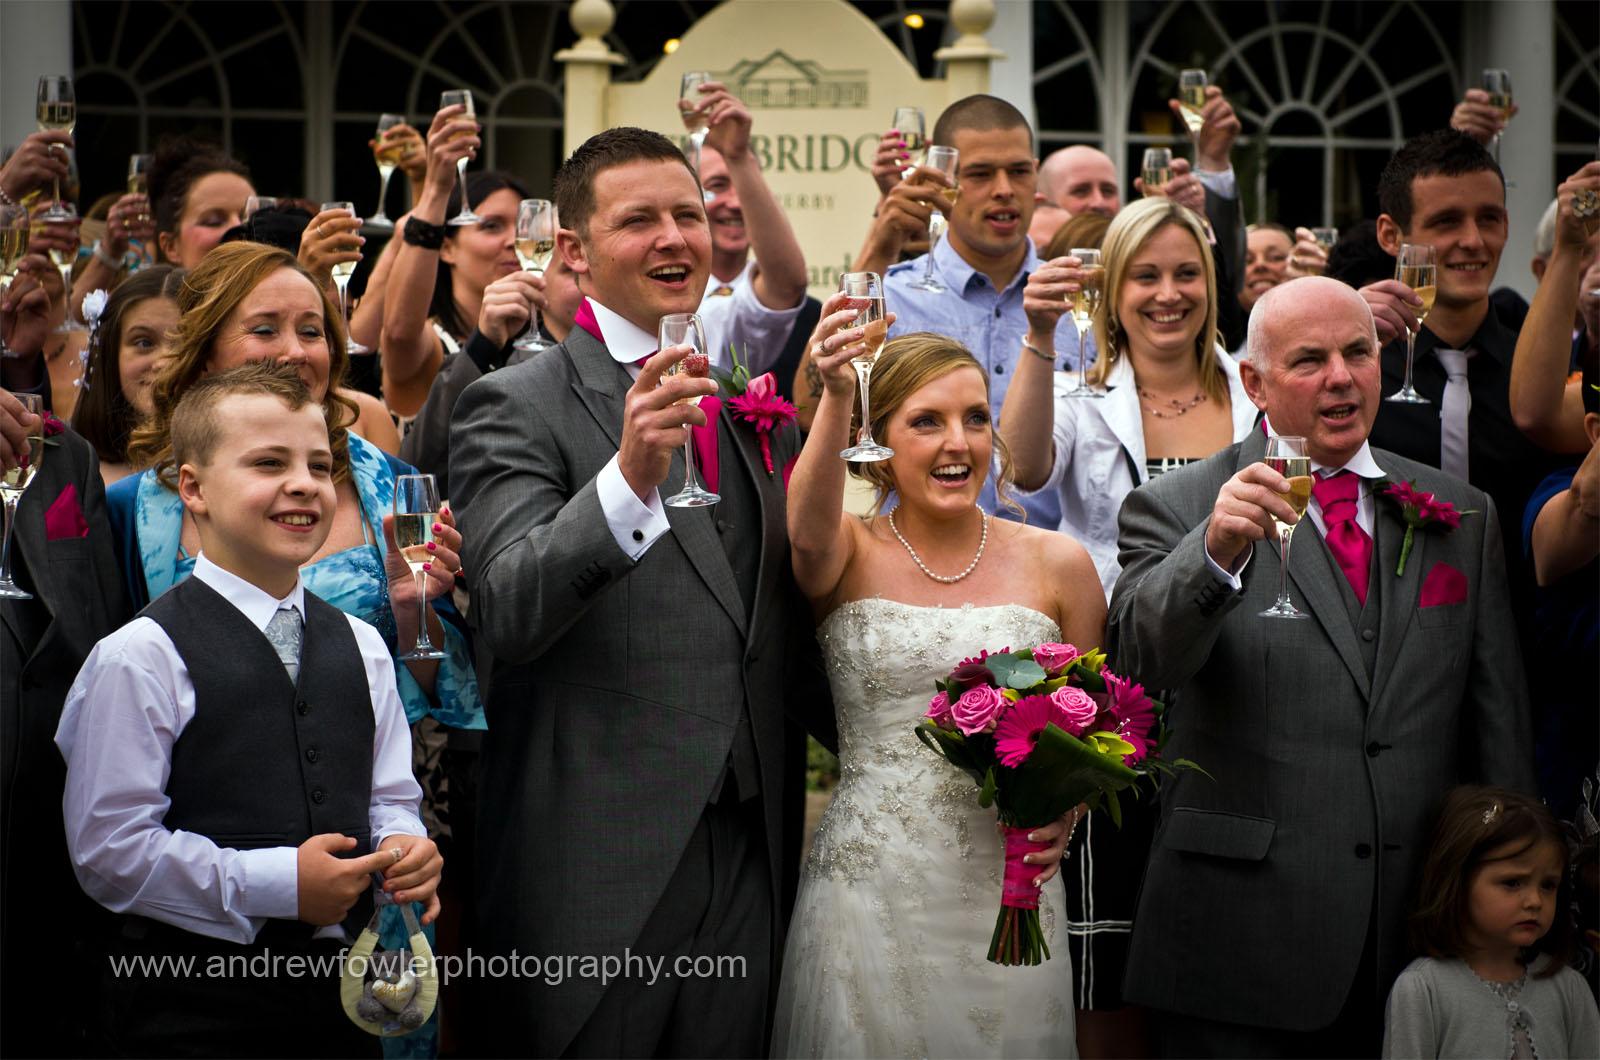 http://3.bp.blogspot.com/-FhElNrUMhpE/TdrR1AwGZiI/AAAAAAAABII/Nf43crIdVHk/s1600/Bridge_Inn_Wedding_09.jpg